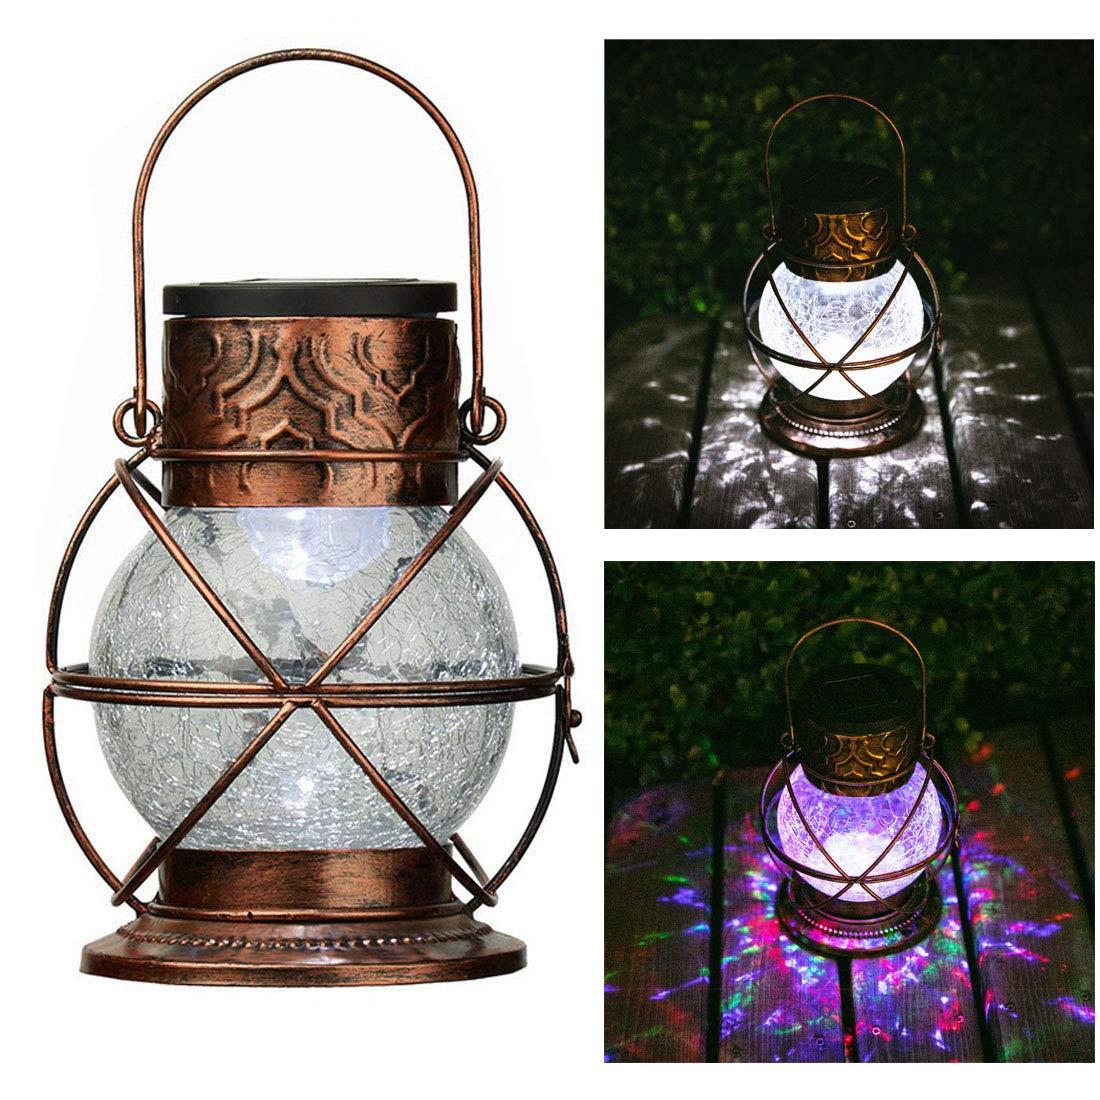 Go2garden Solar Lantern Outdoor Hanging Garden Lights, Decorative Rainbow Lamp Metal&Glass for Patio Tabletop Decorations (Bronze) by Go2garden